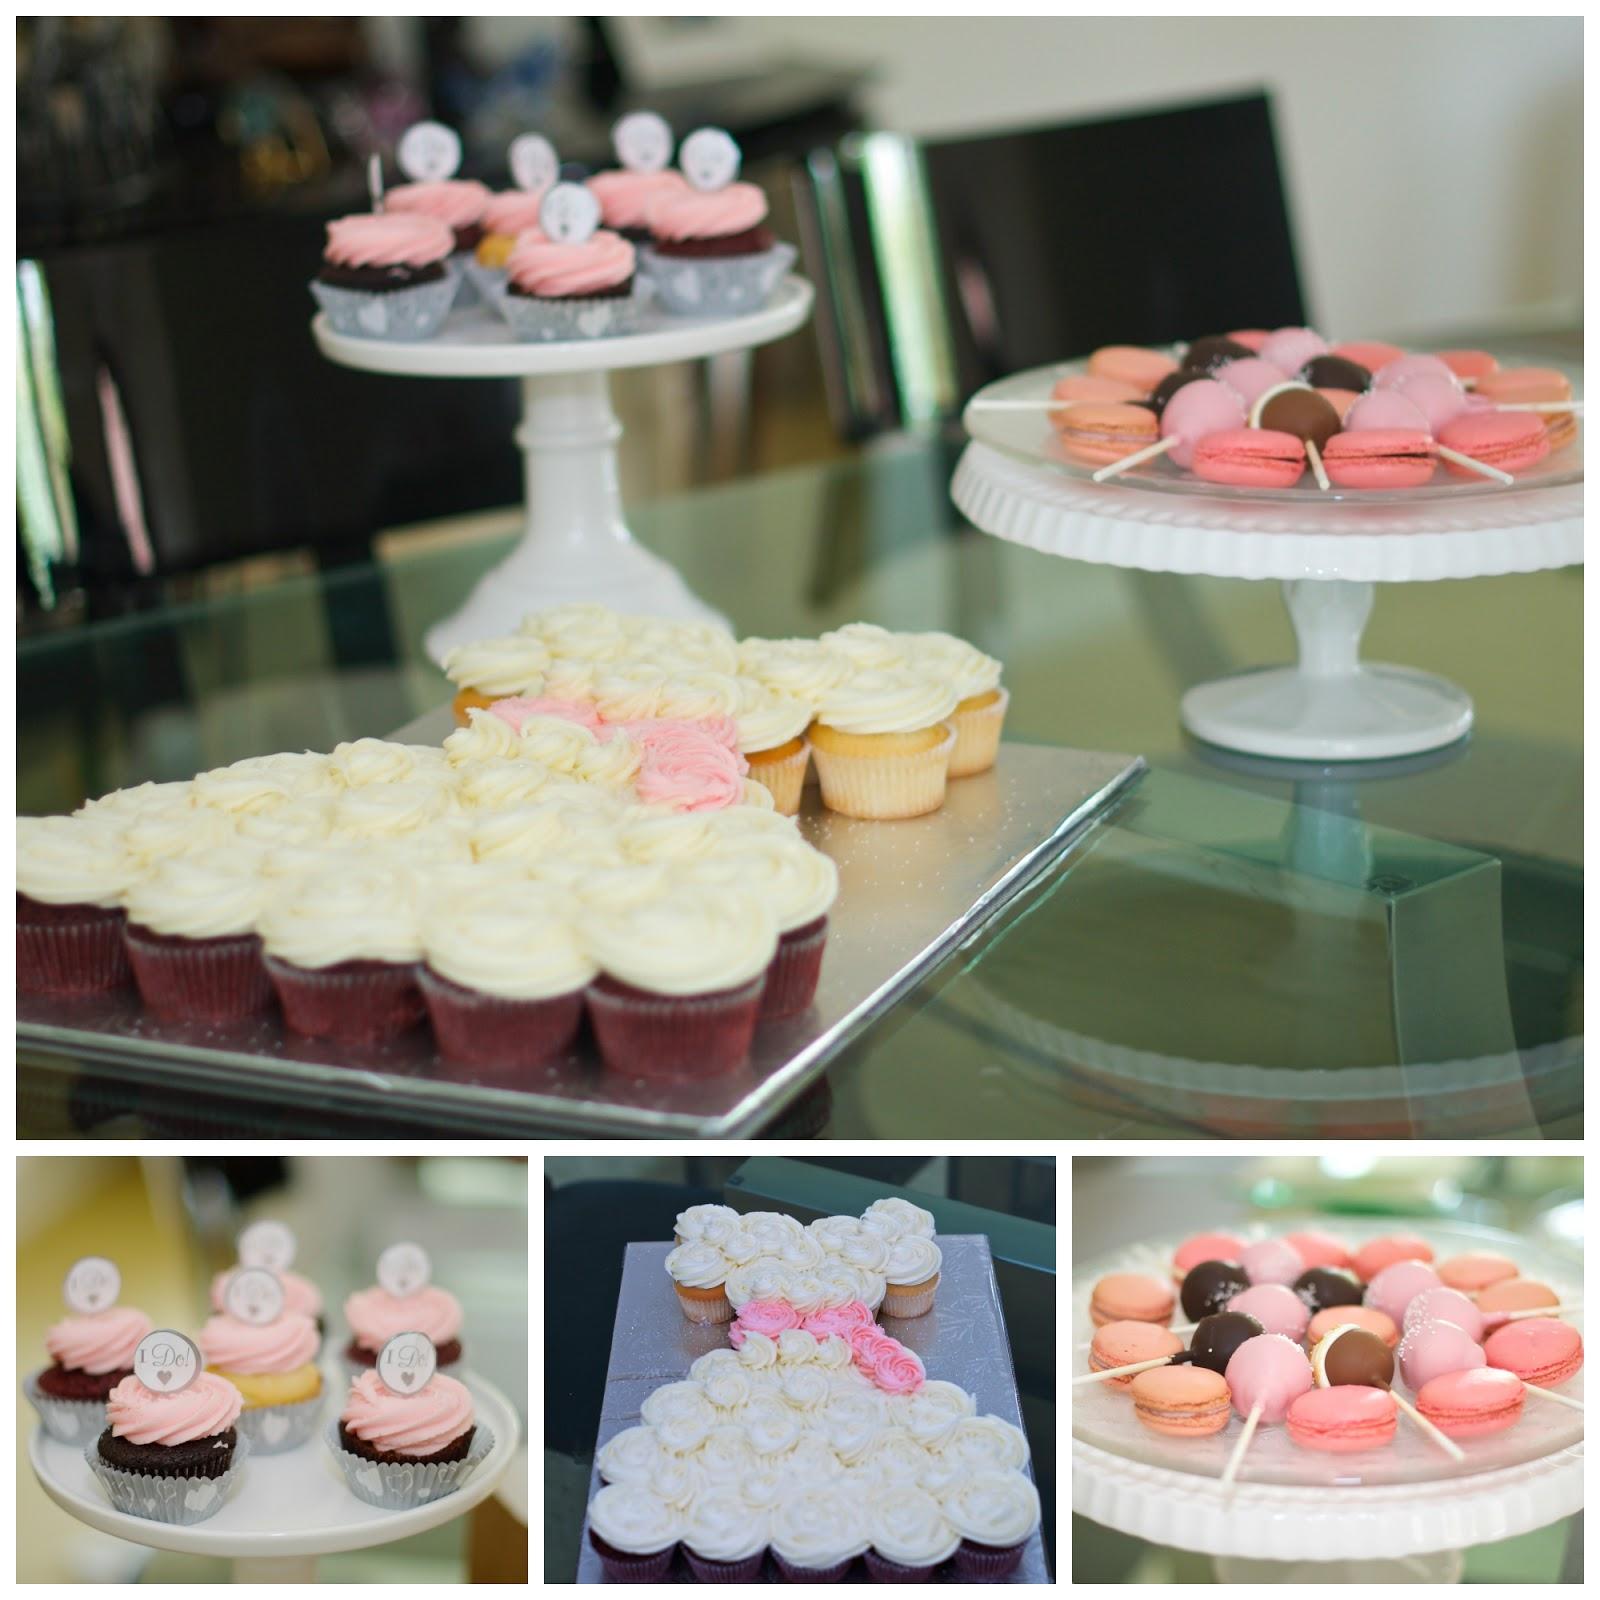 Wedding Dress Cupcake Cake 36 Great Then arrange the treats